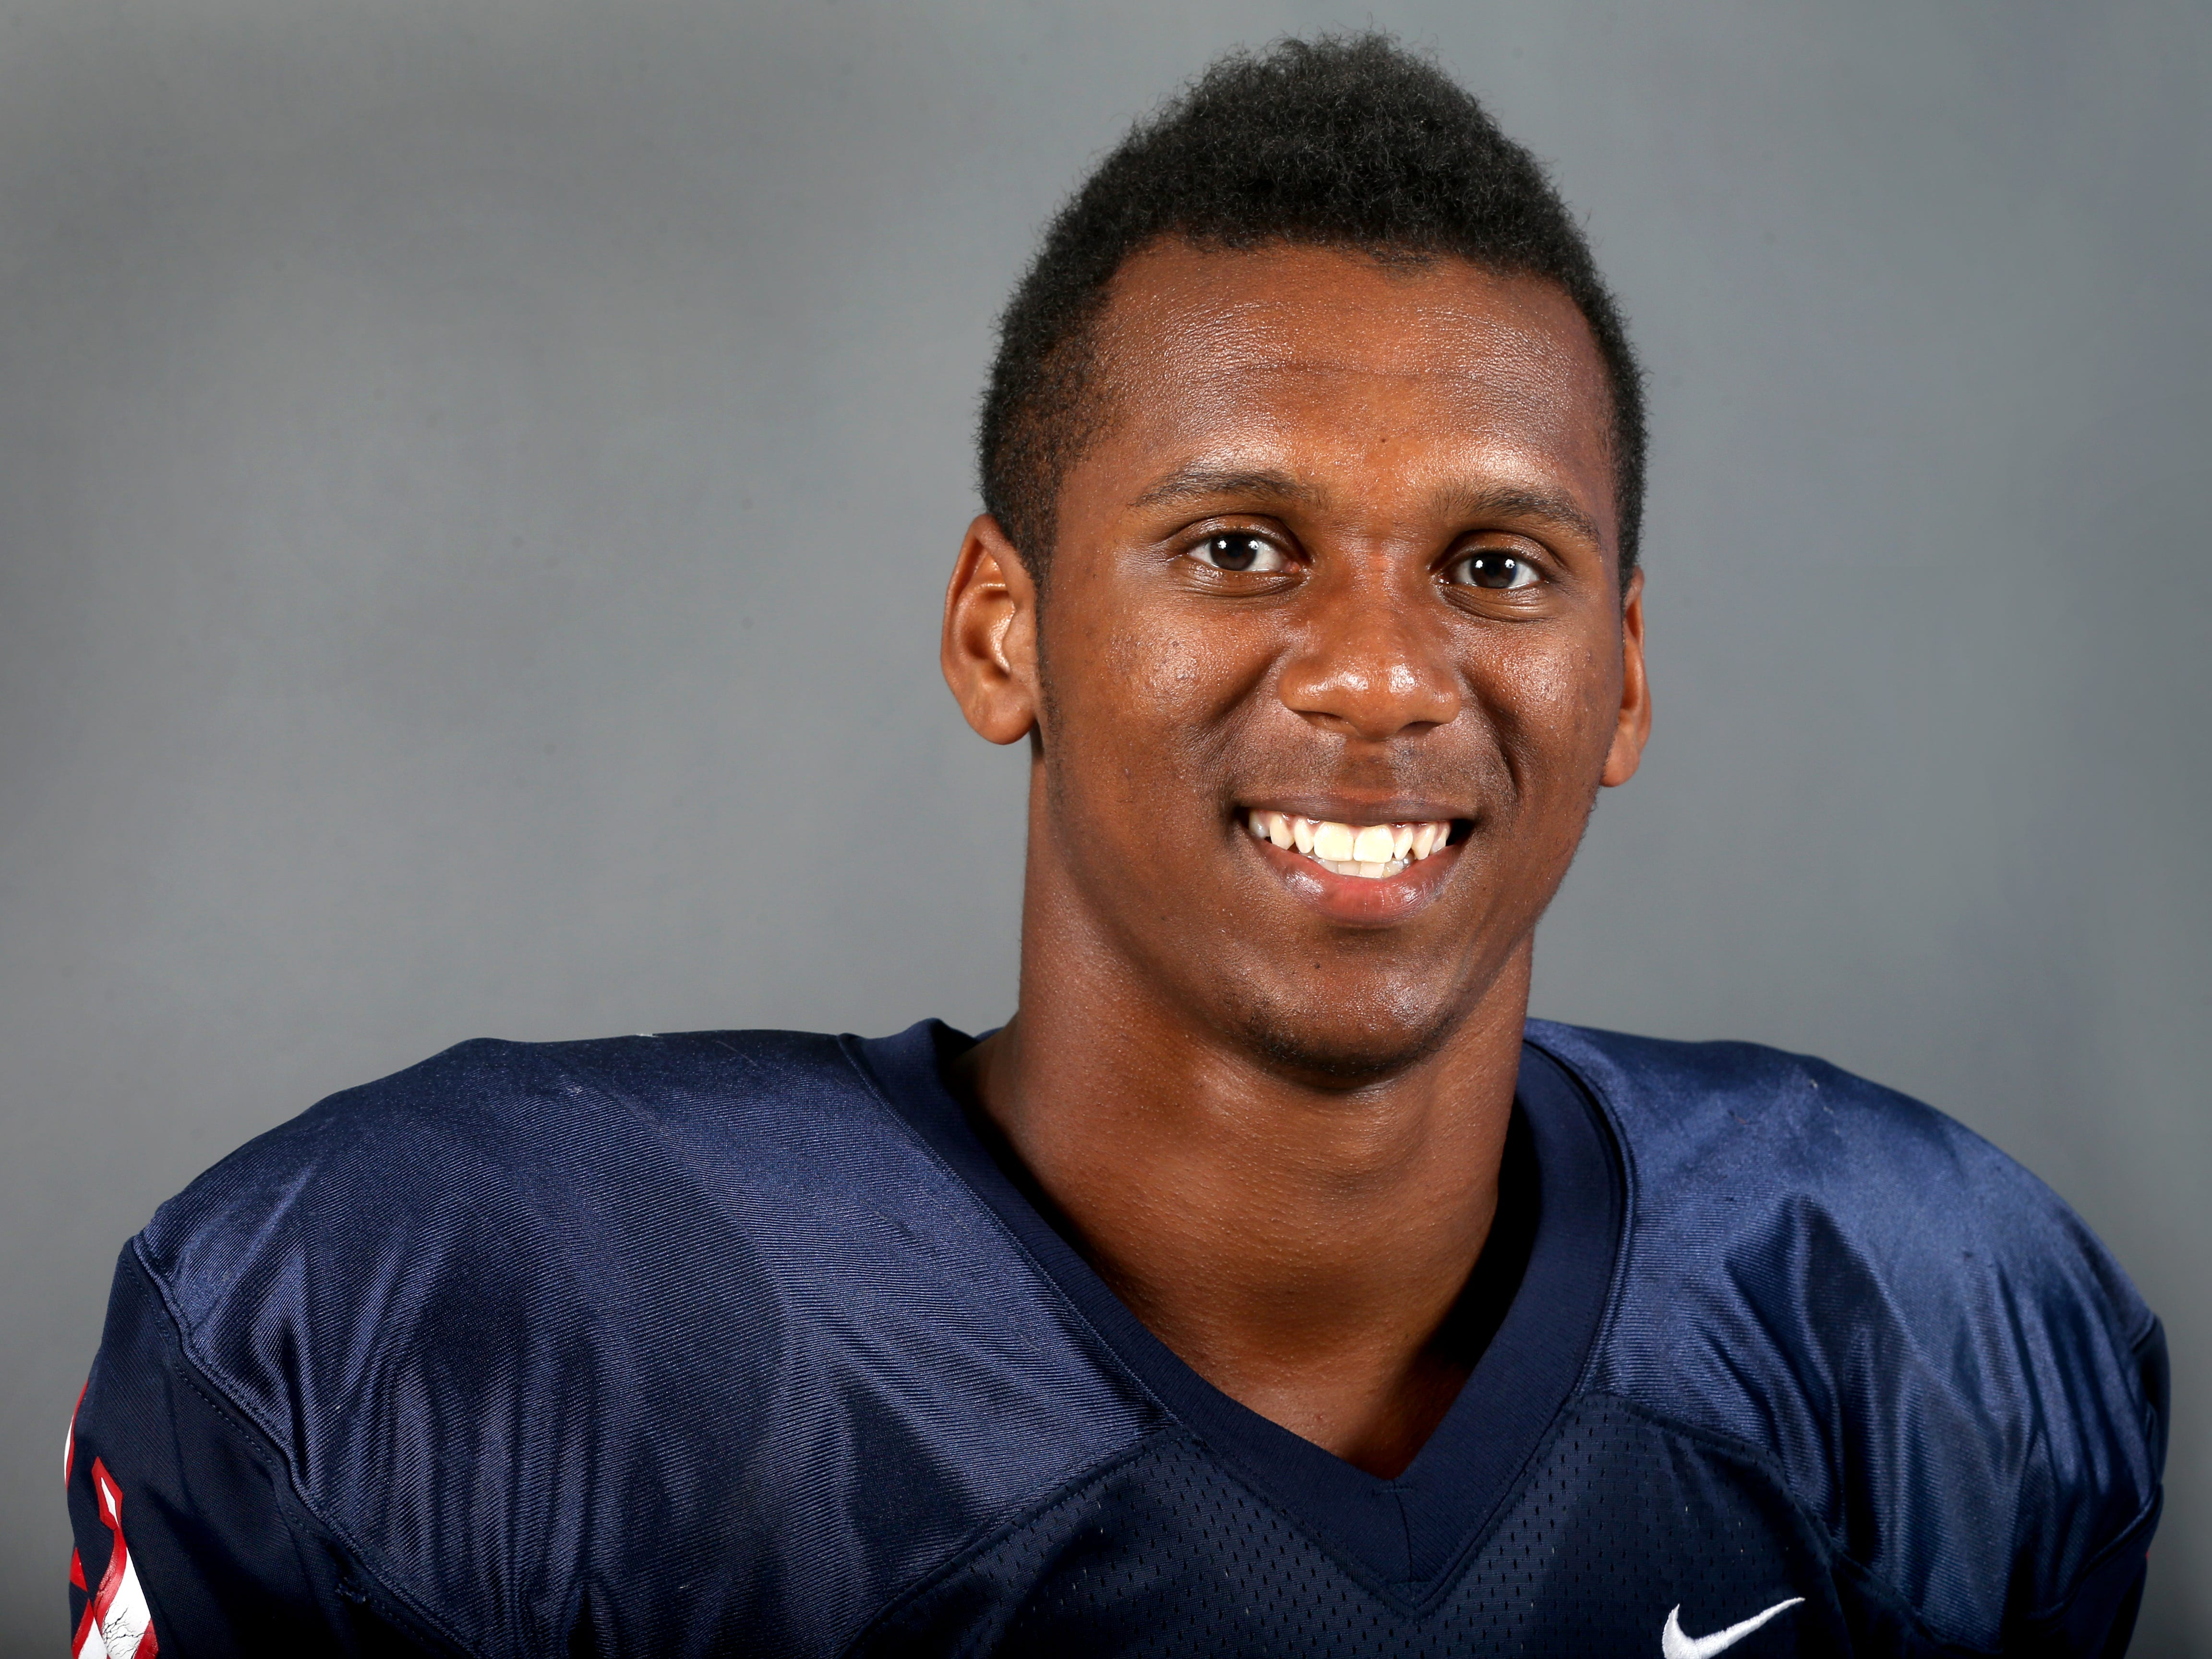 Oakland's Josh Smith, Linebacker, on Saturday August 2, 2014.